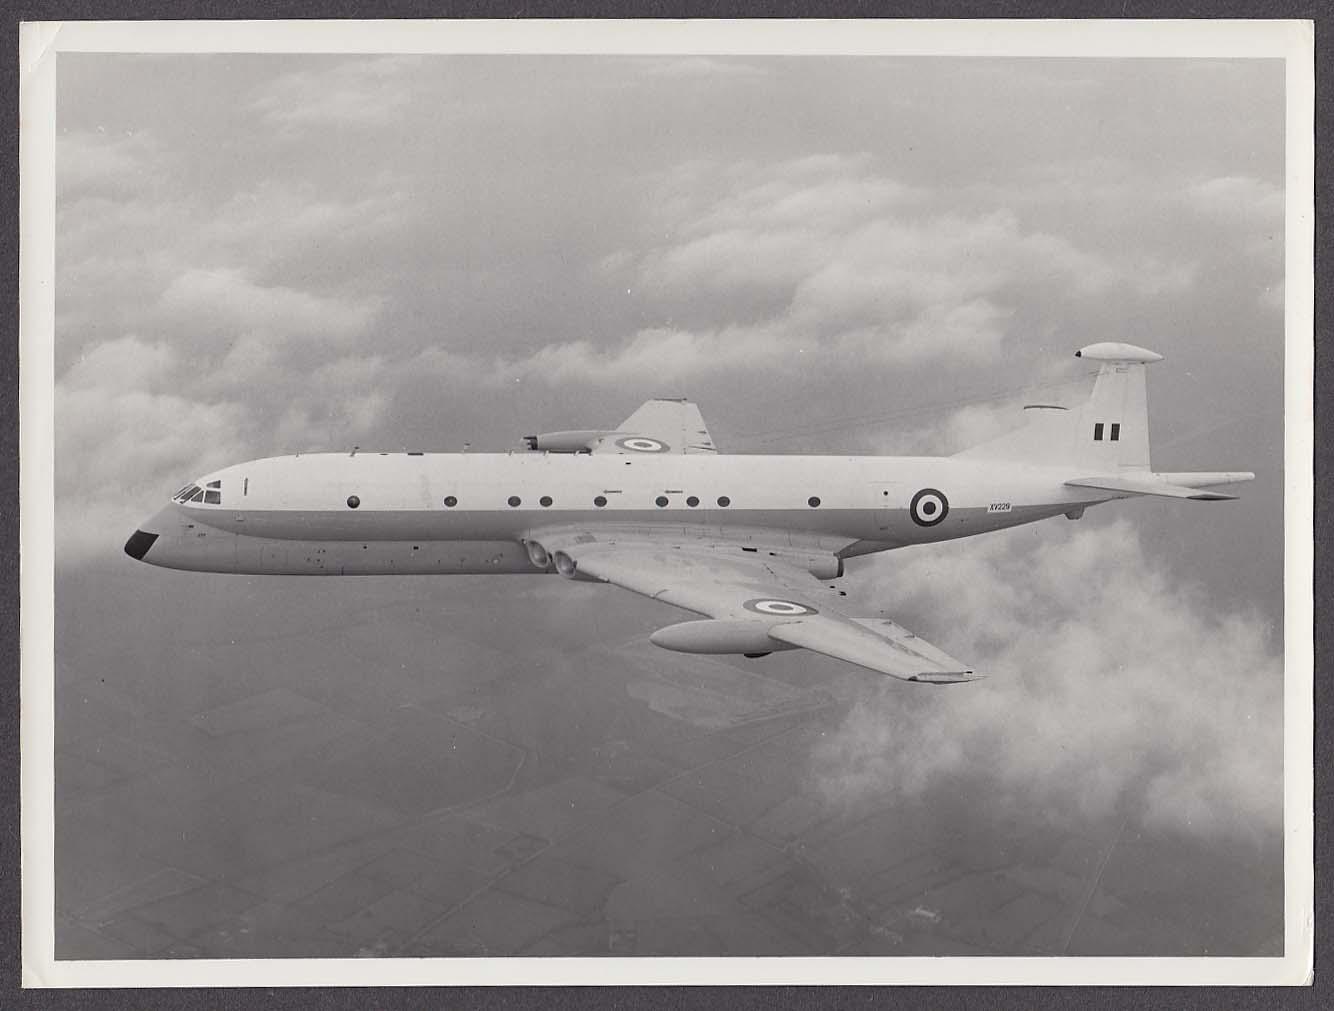 Royal Air Force RAF HS Nimrod MR2 jet XV229 in flight photo 1970